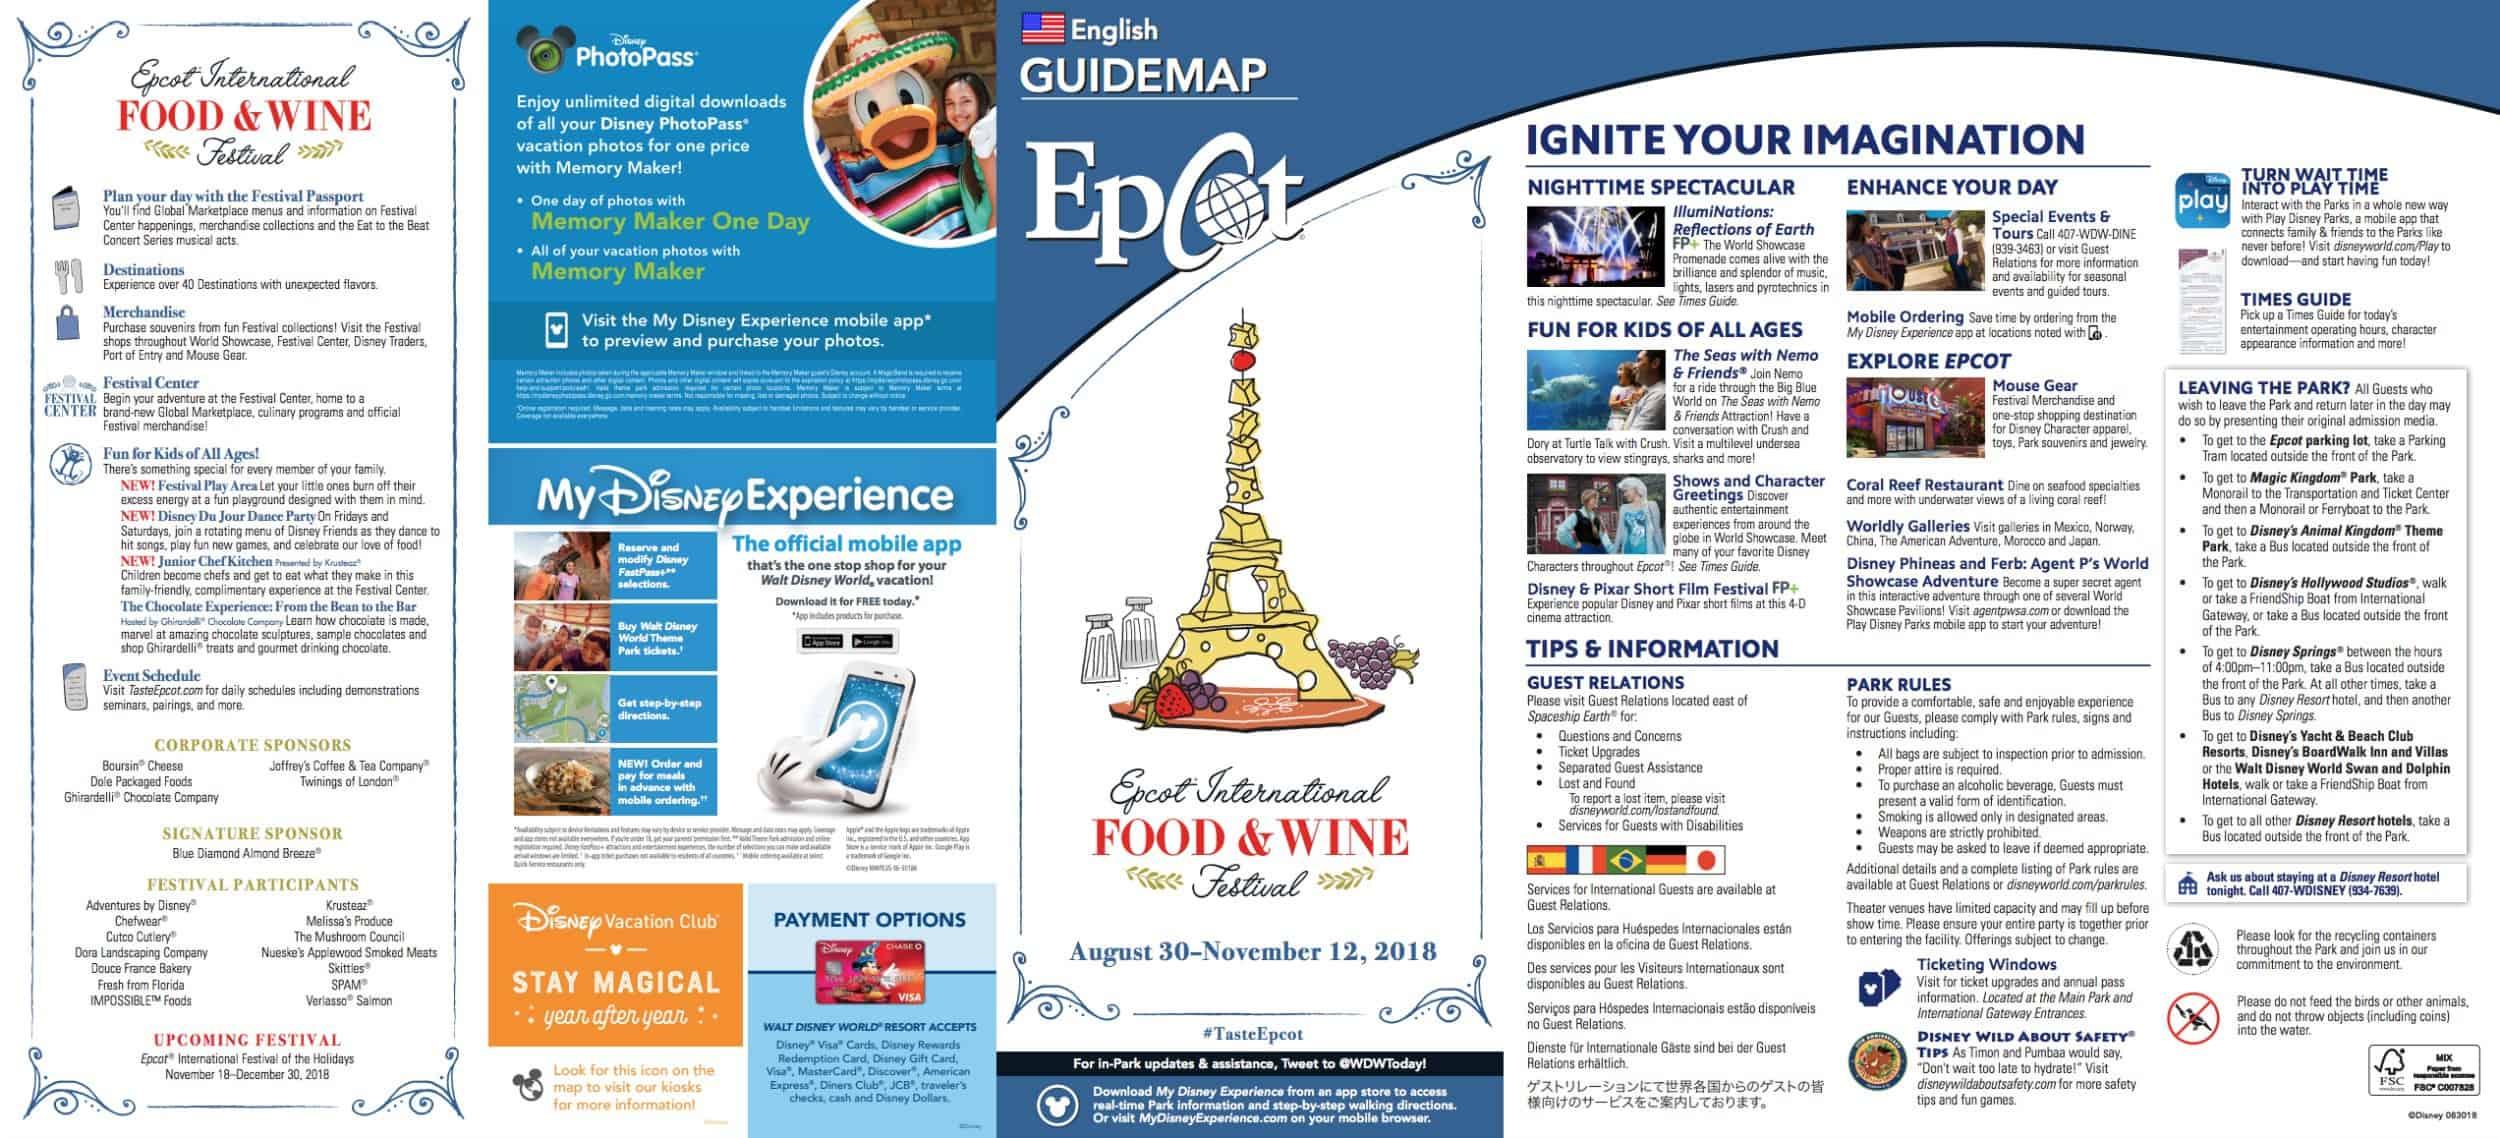 food-wine-festival-map | WDW Prep School